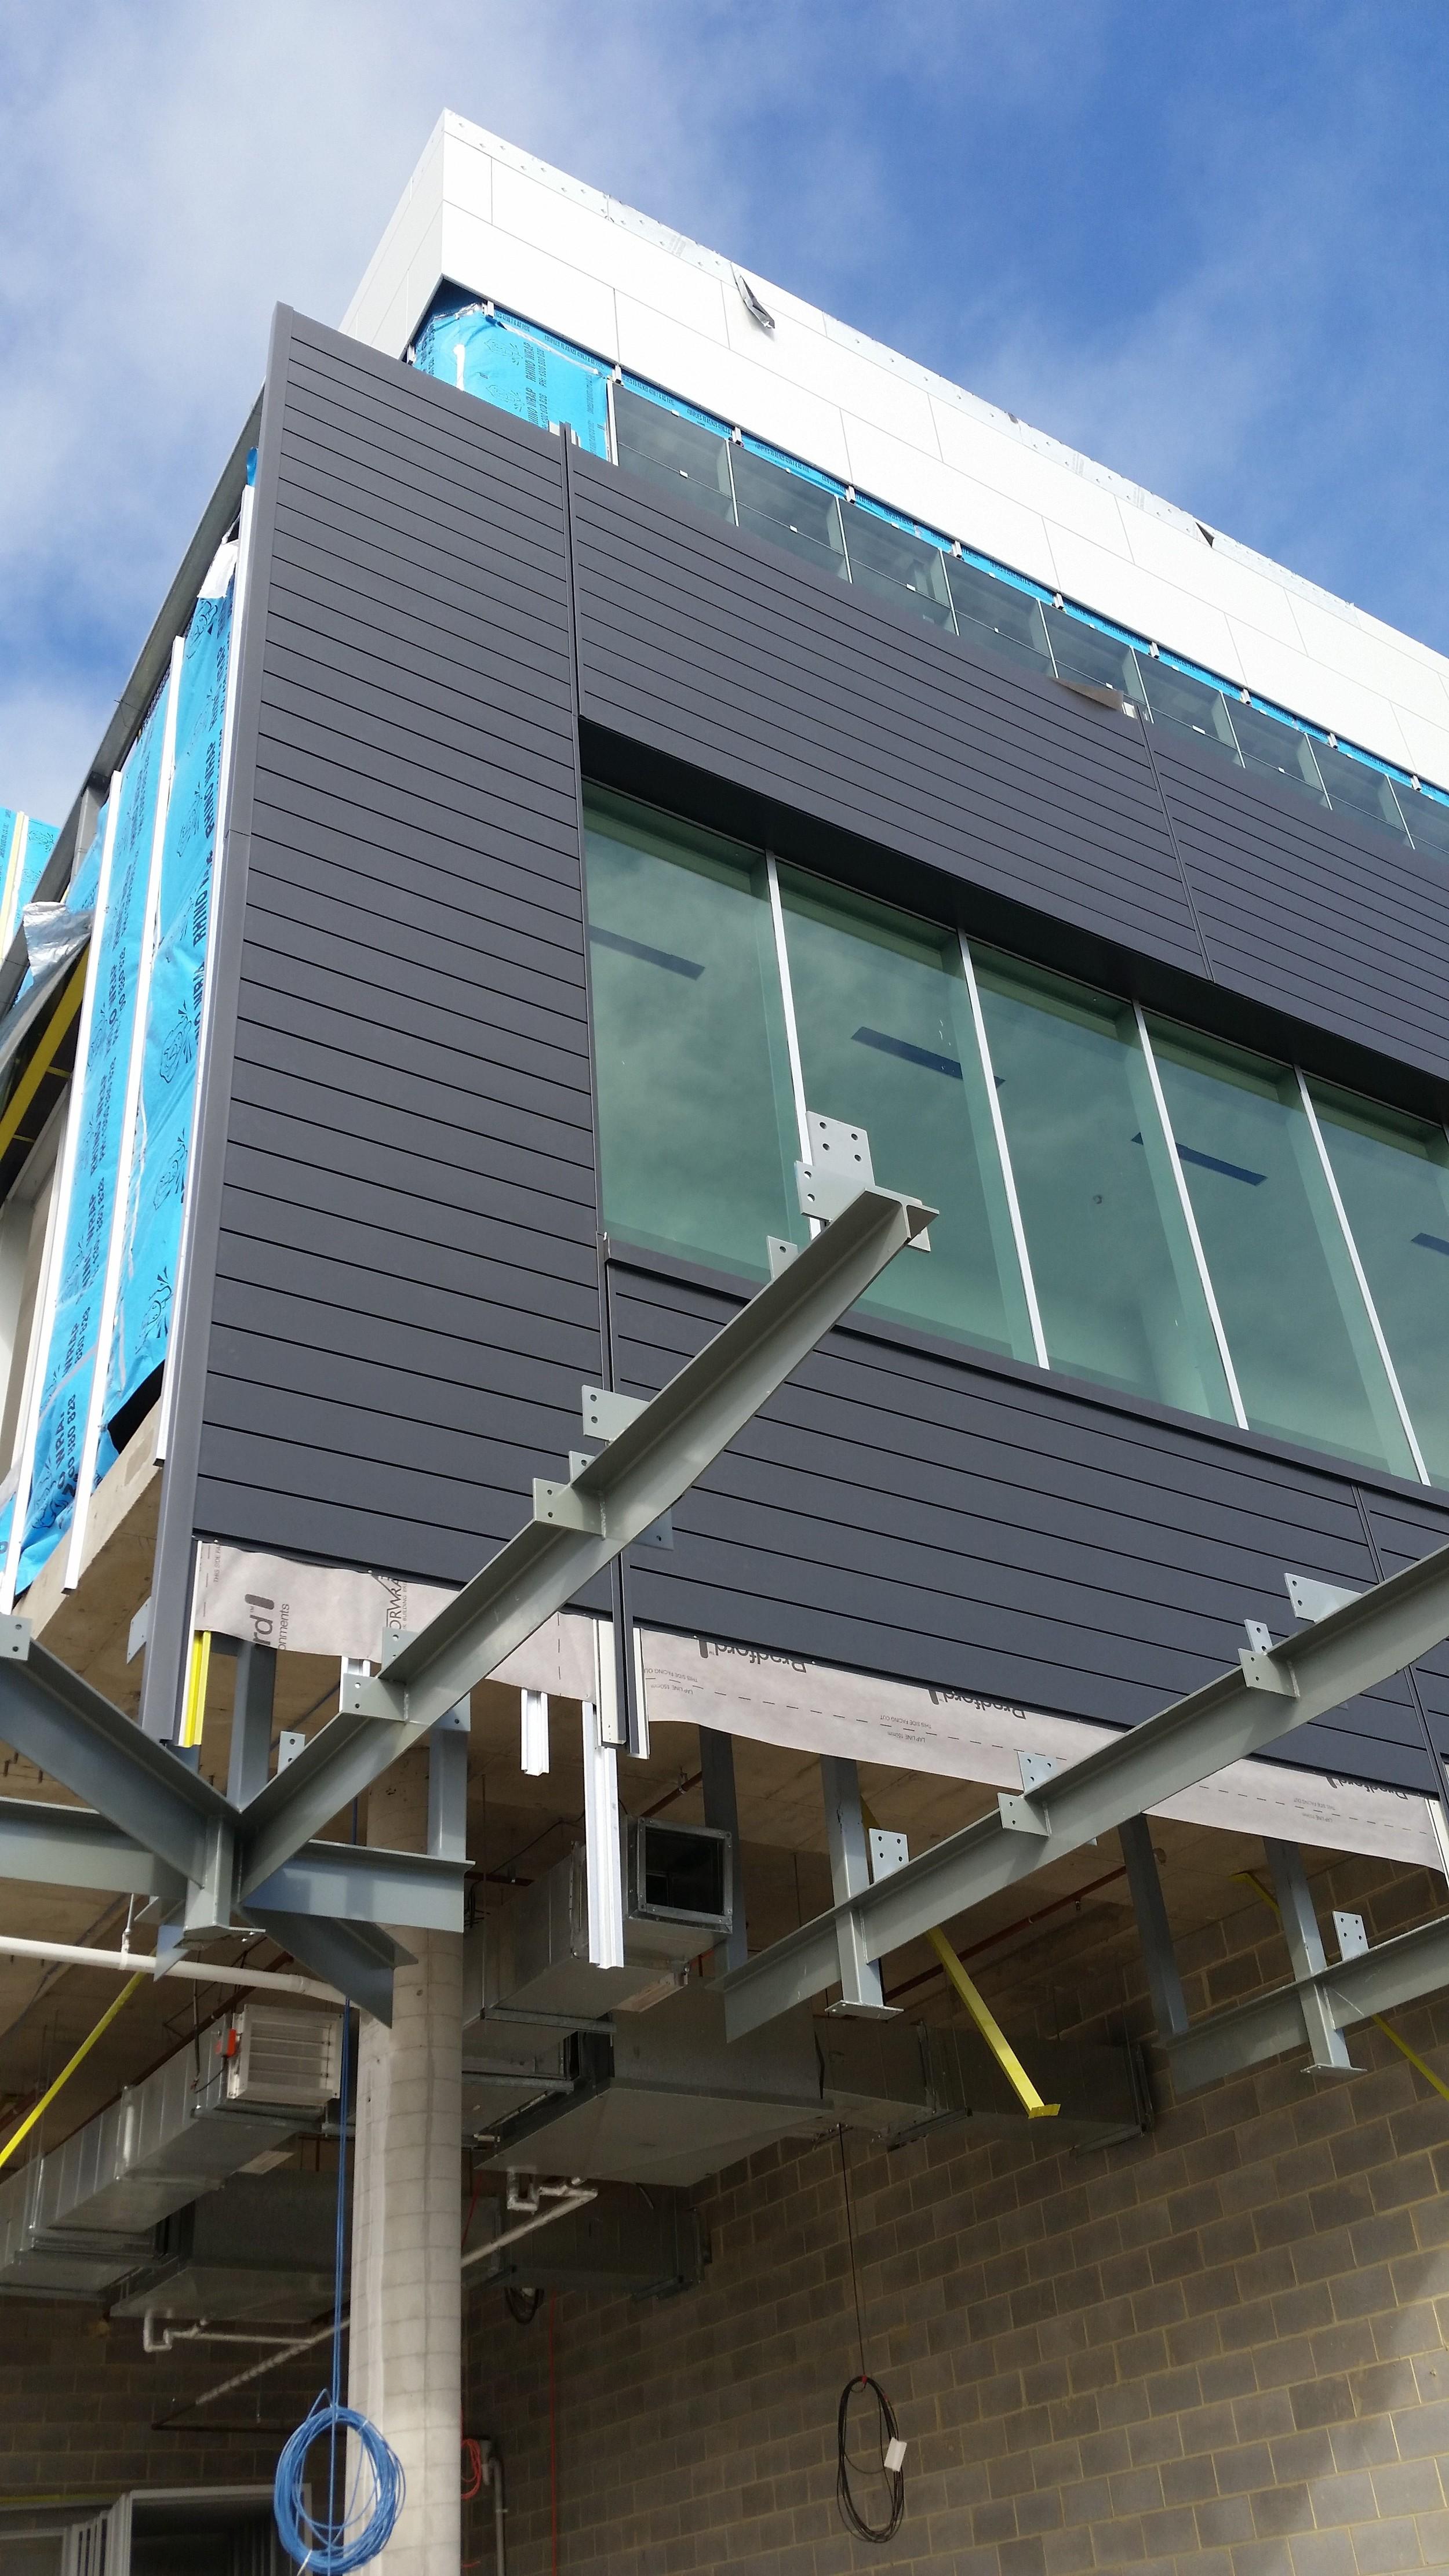 PVDF Aluminium Naturel - Colour Charcoal Black - Horizontal Express Panels